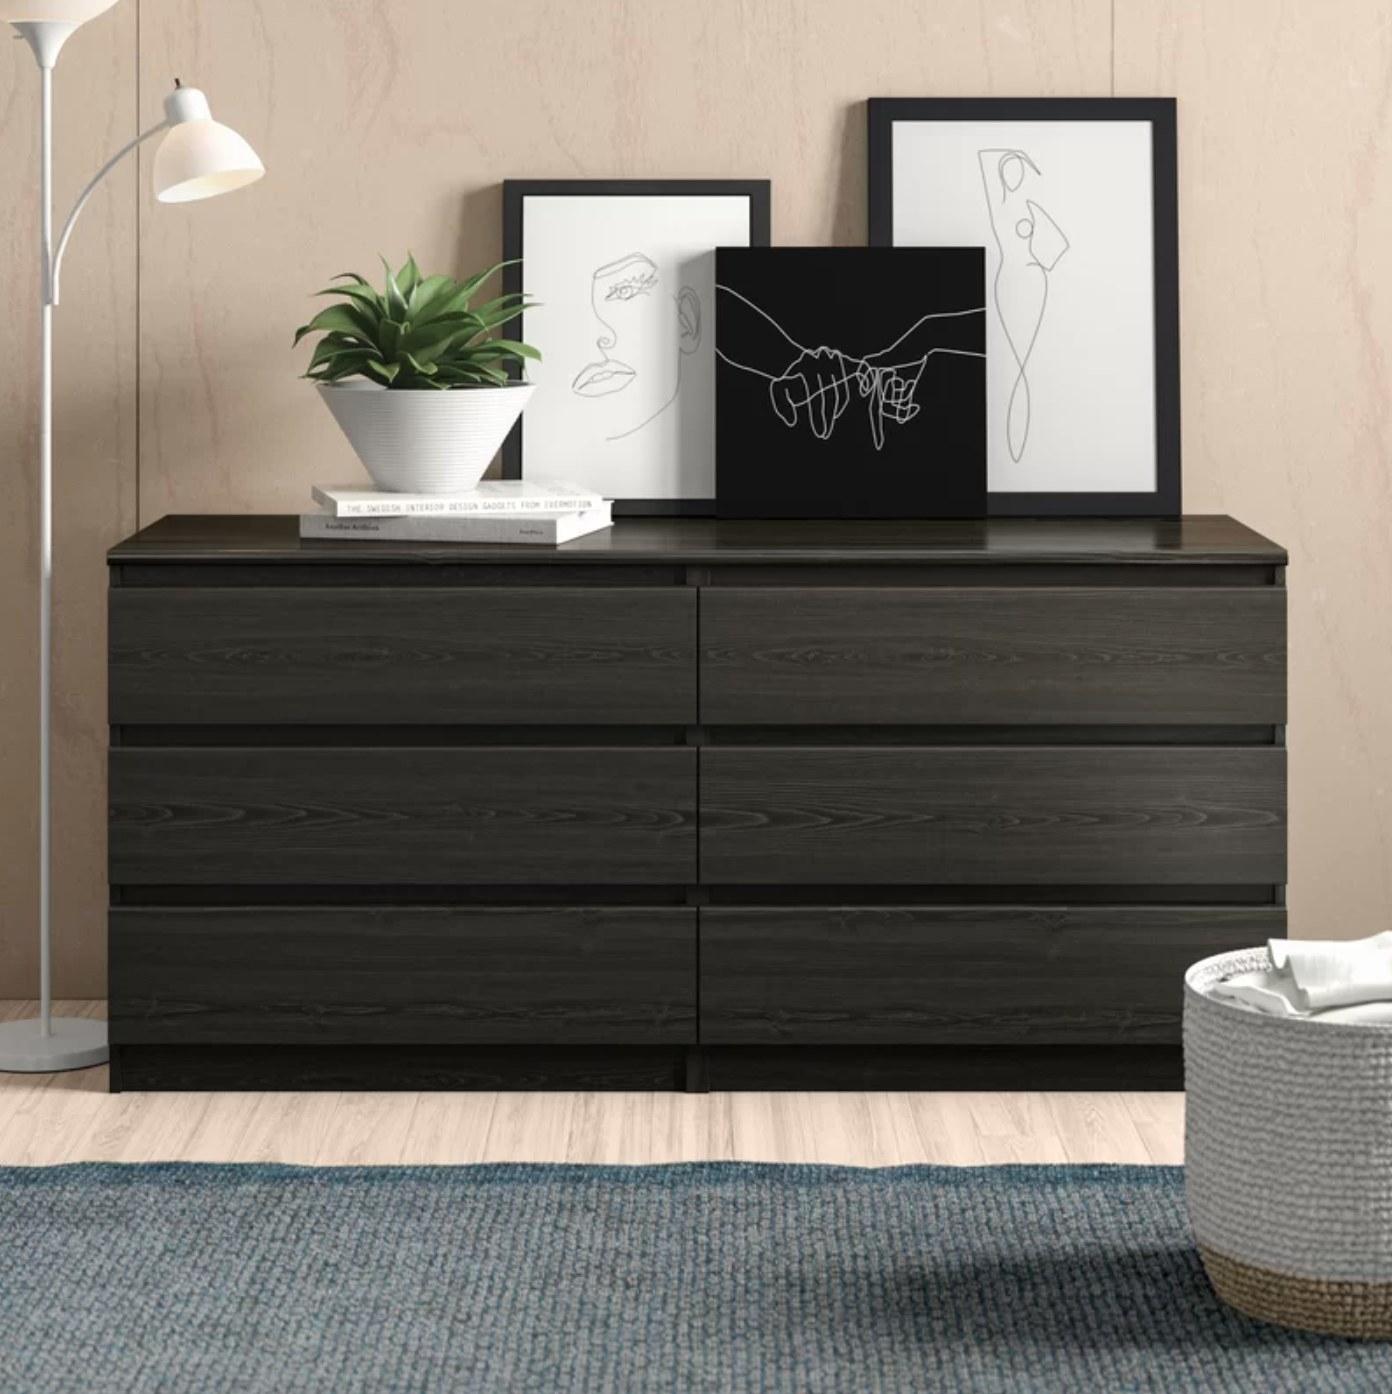 The six drawer dresser in black wood grain